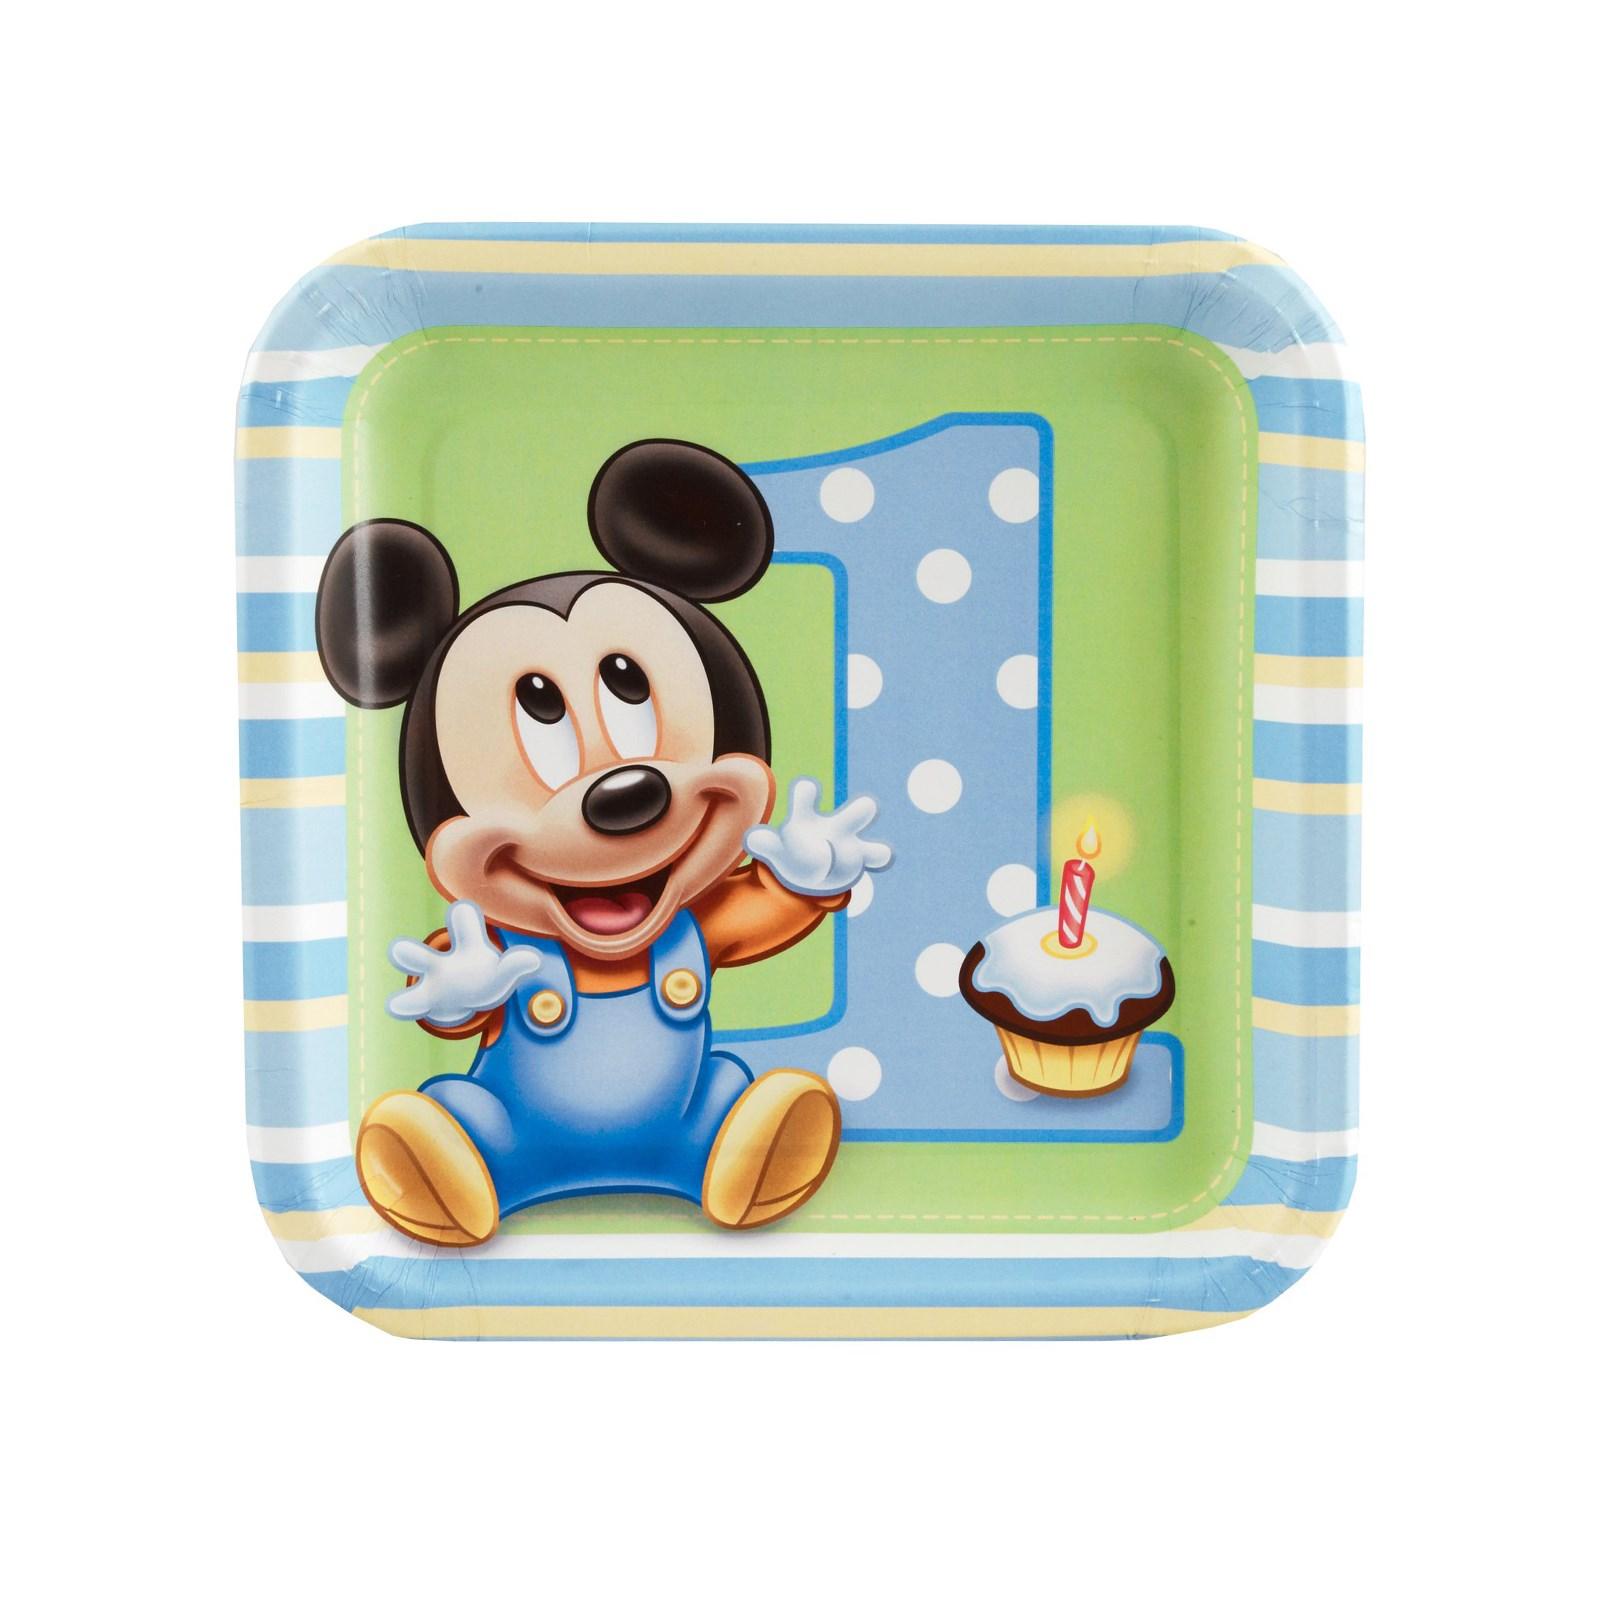 Disney Mickeys 1st Birthday Square Dessert Plates 8 count